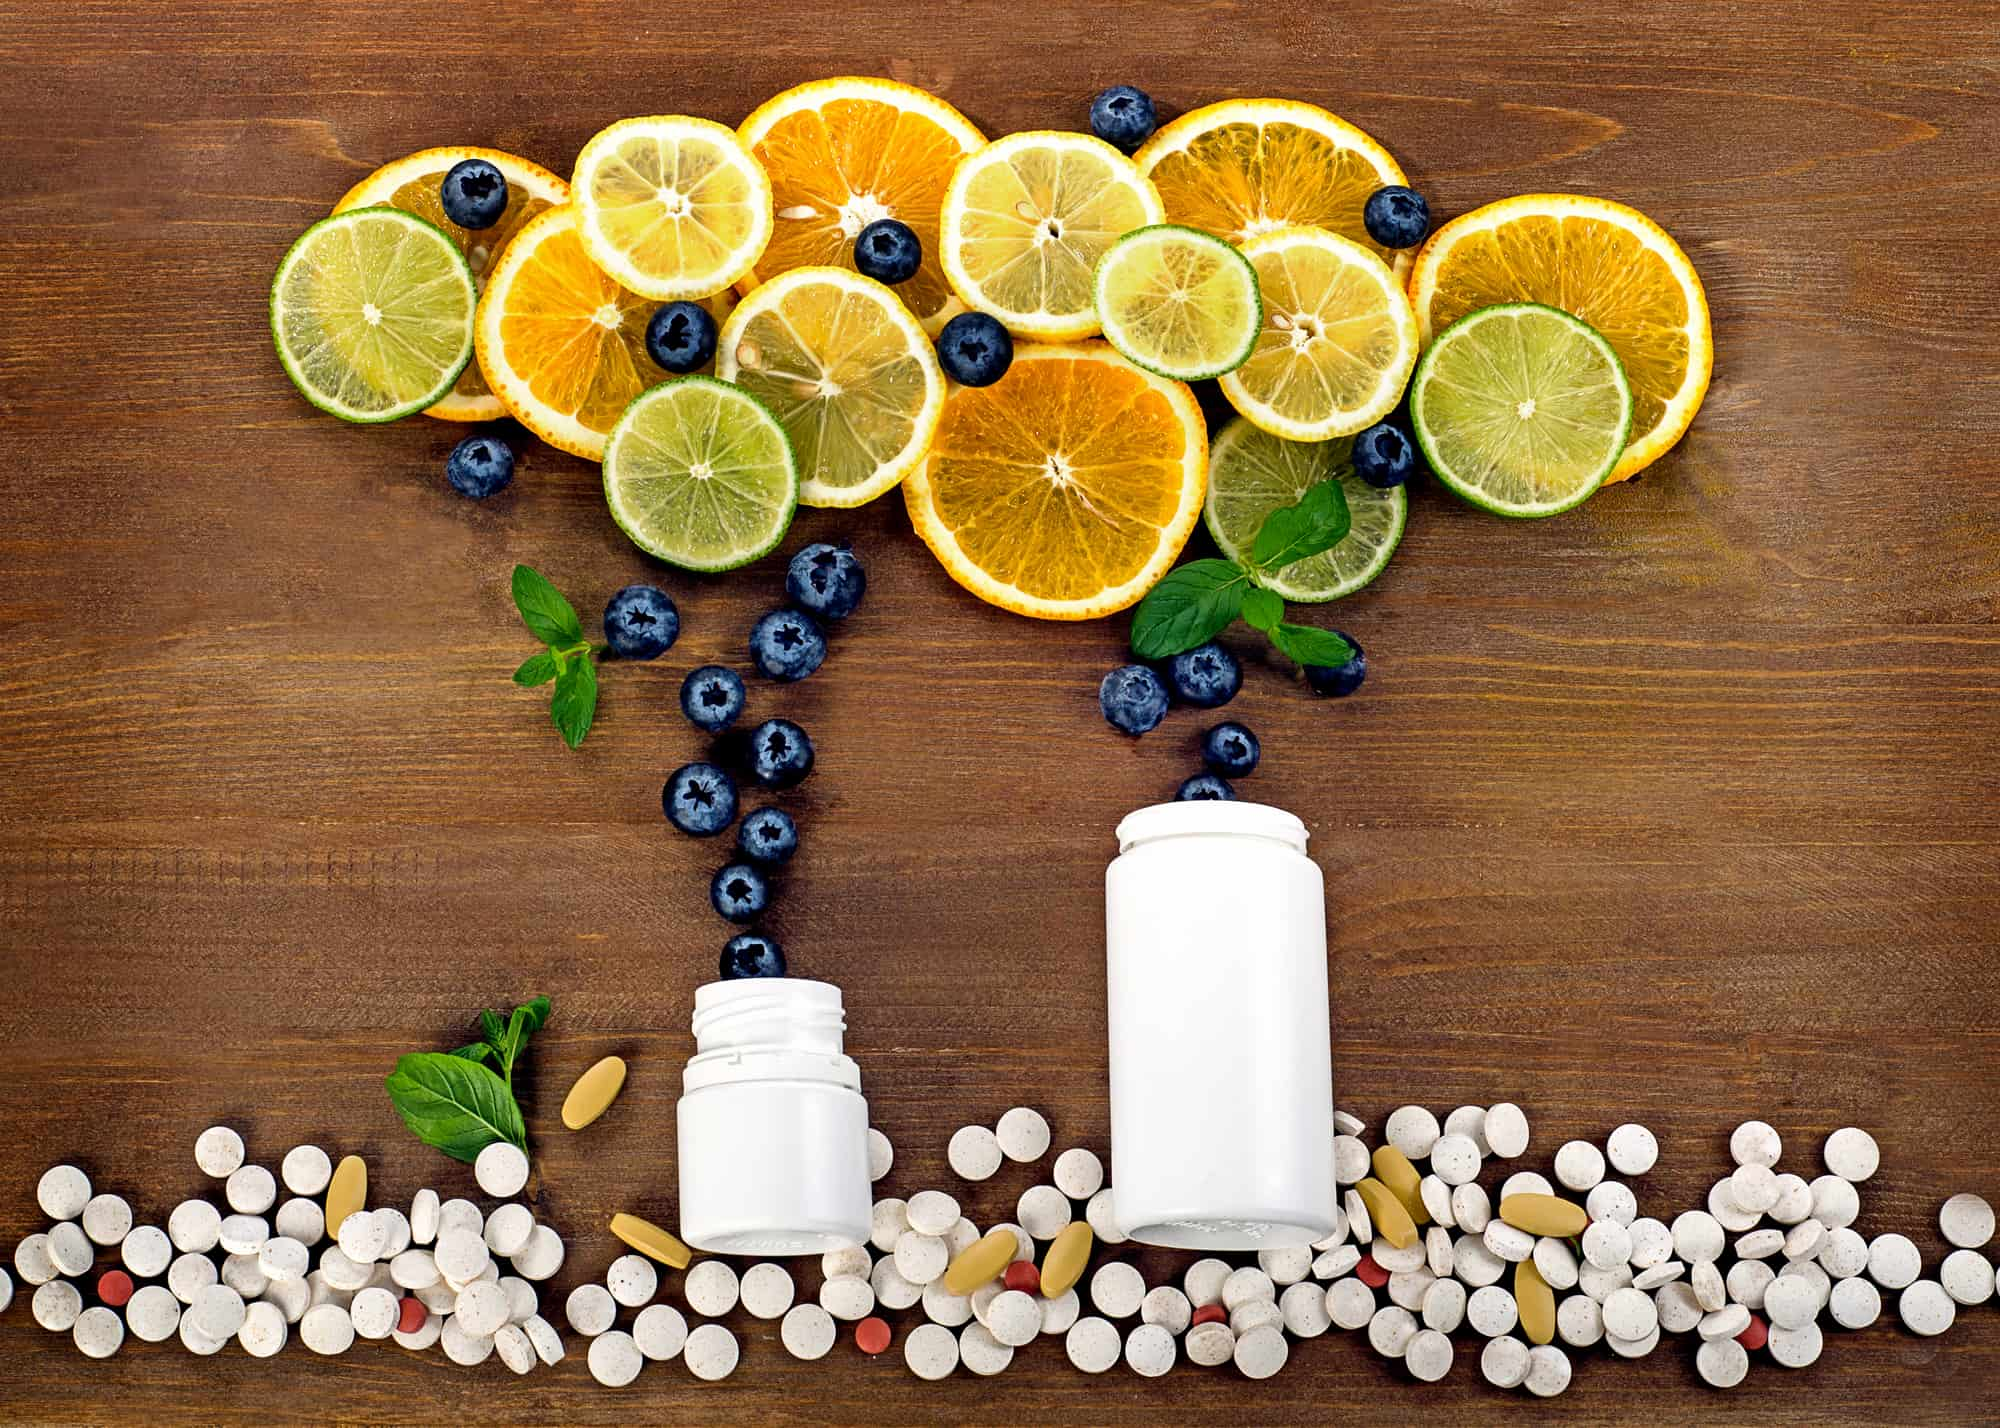 citrus fruits falling into supplement bottles